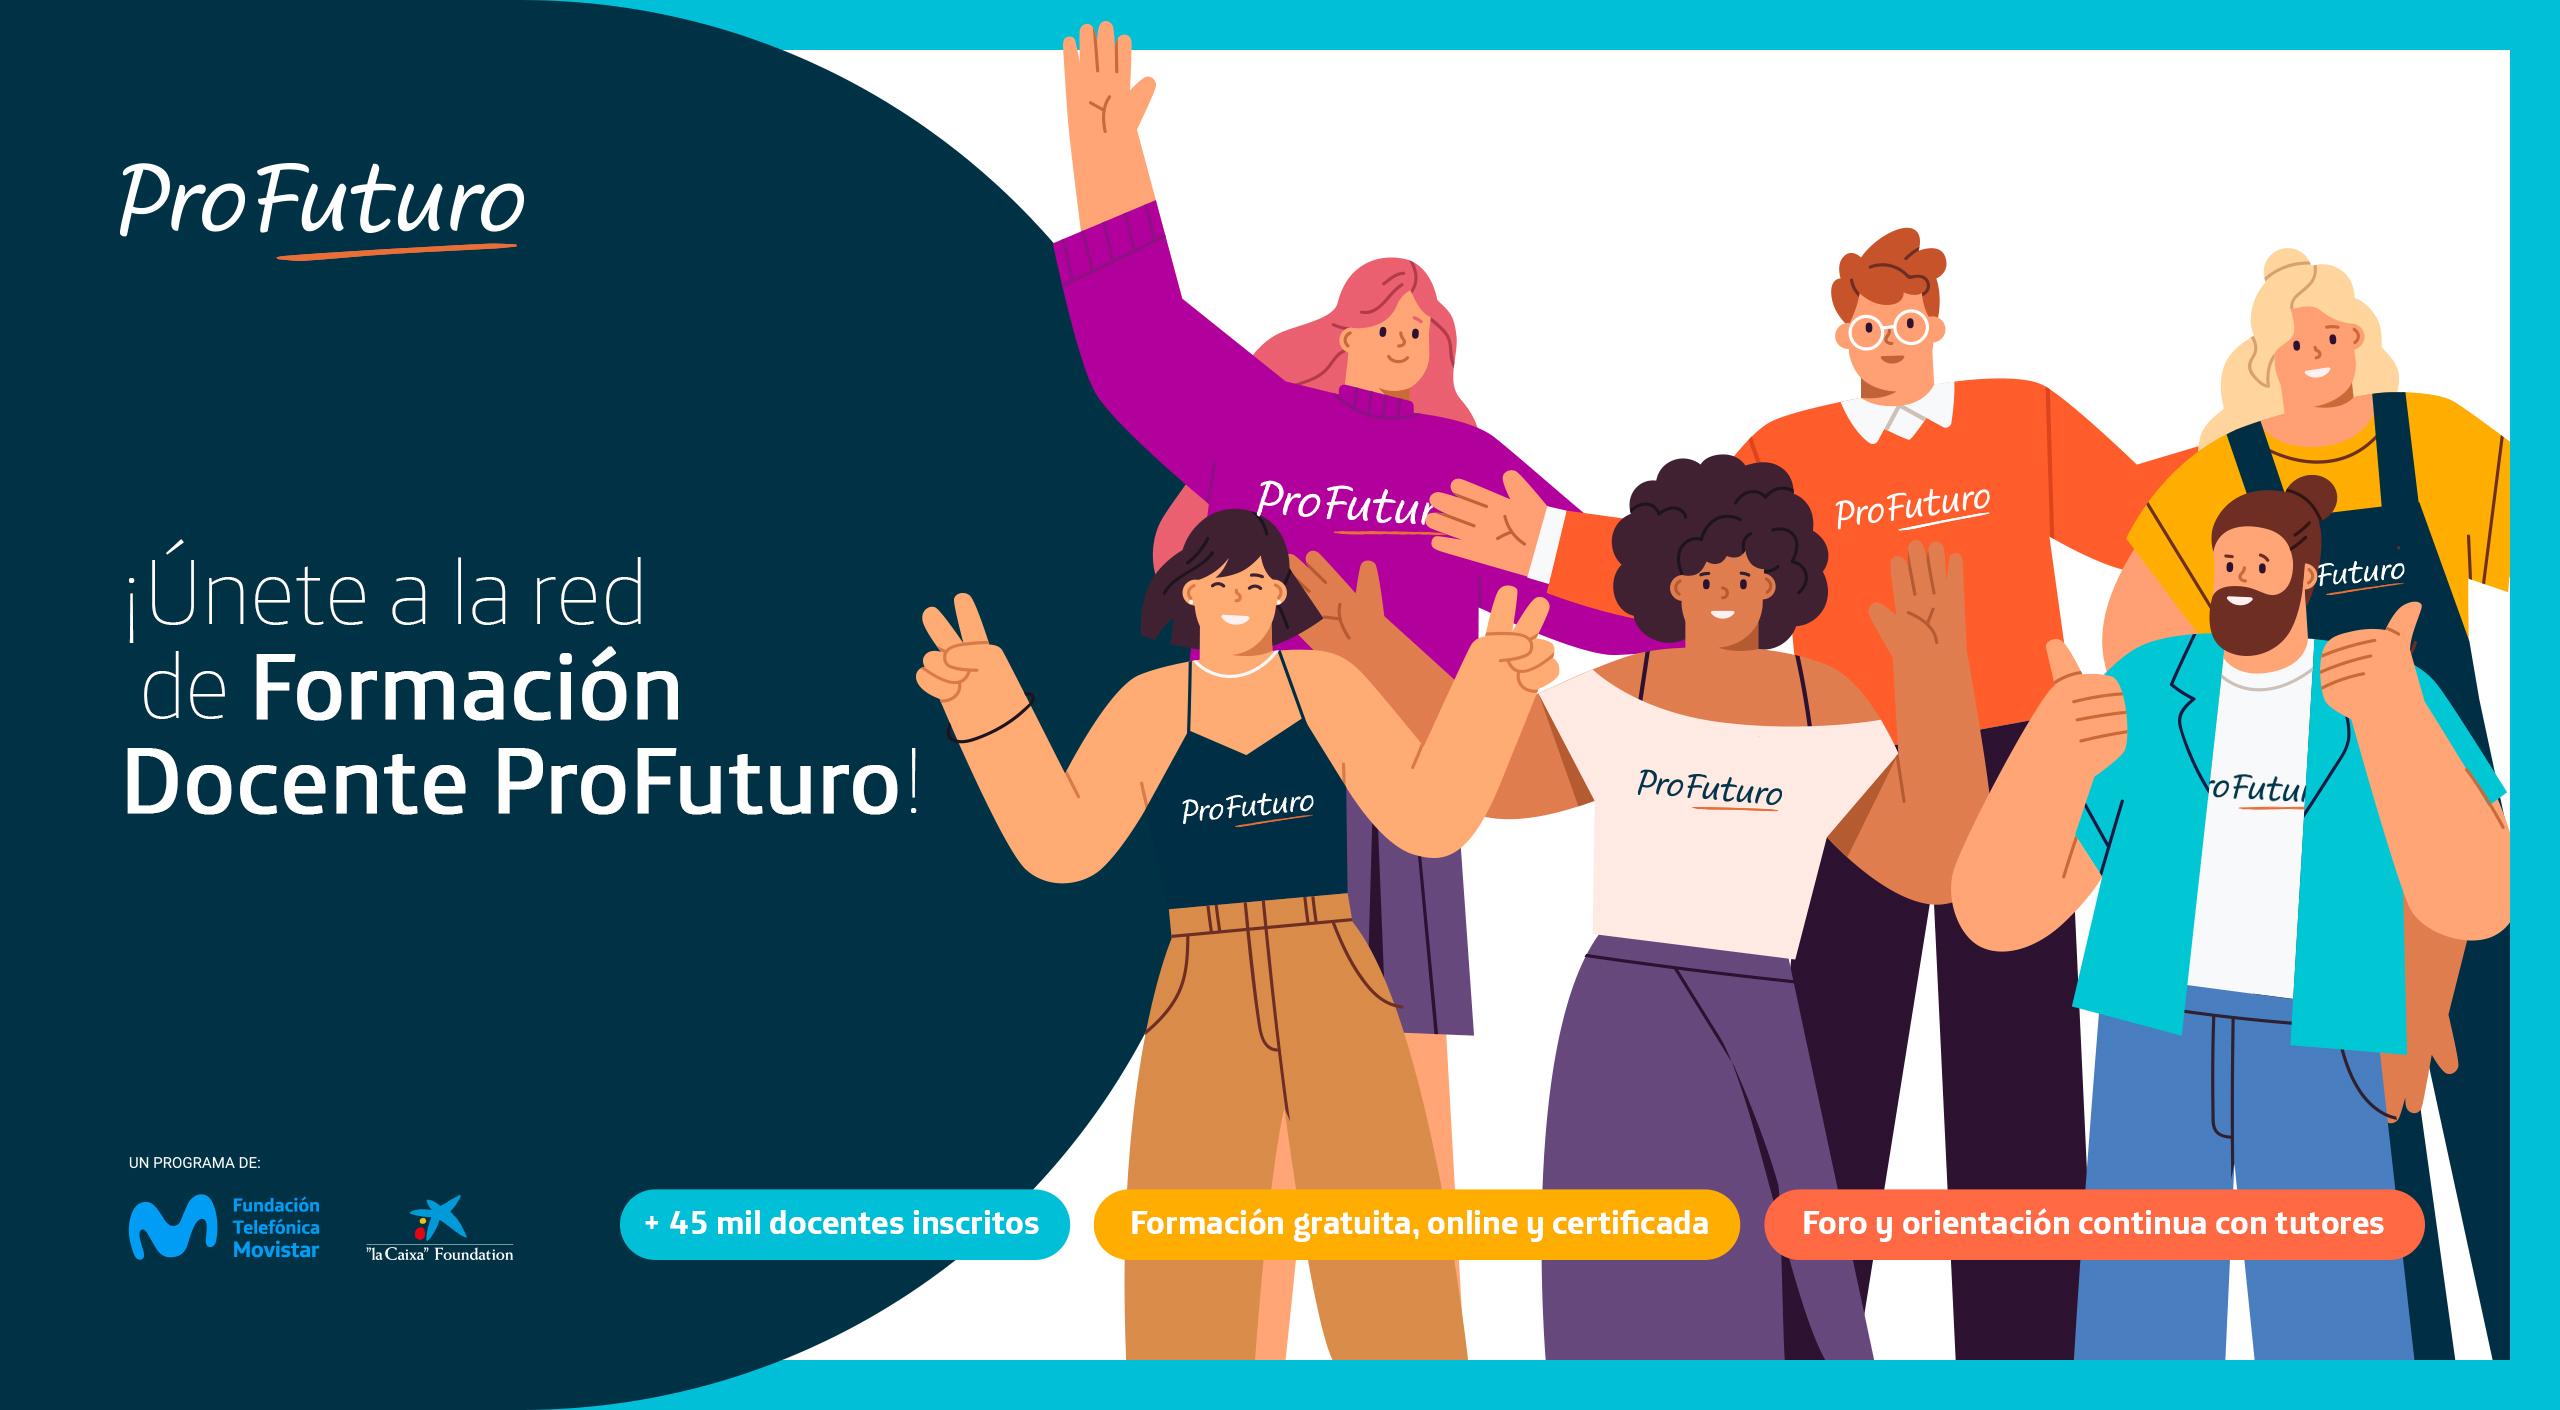 Formación docente ProFuturo | Fundación Telefónica | Chile